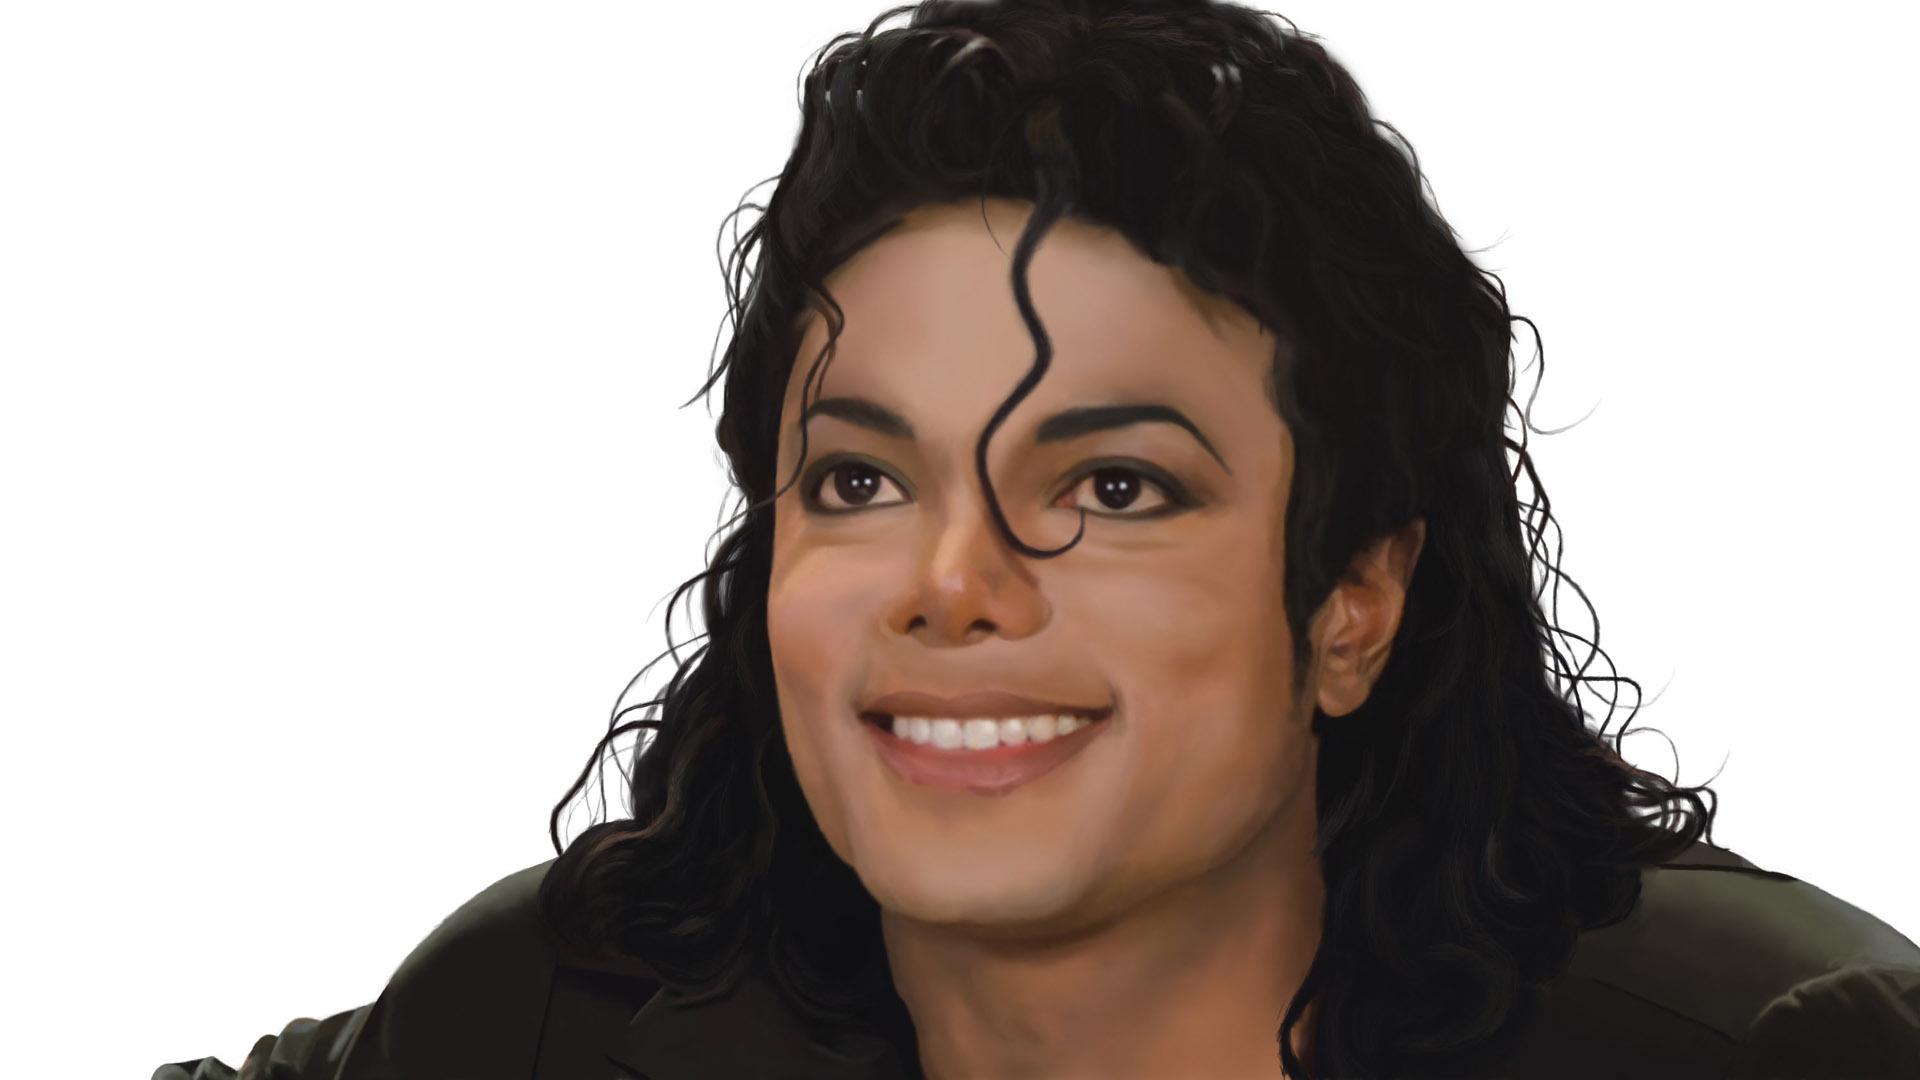 Michael Jackson High Quality Wallpapers